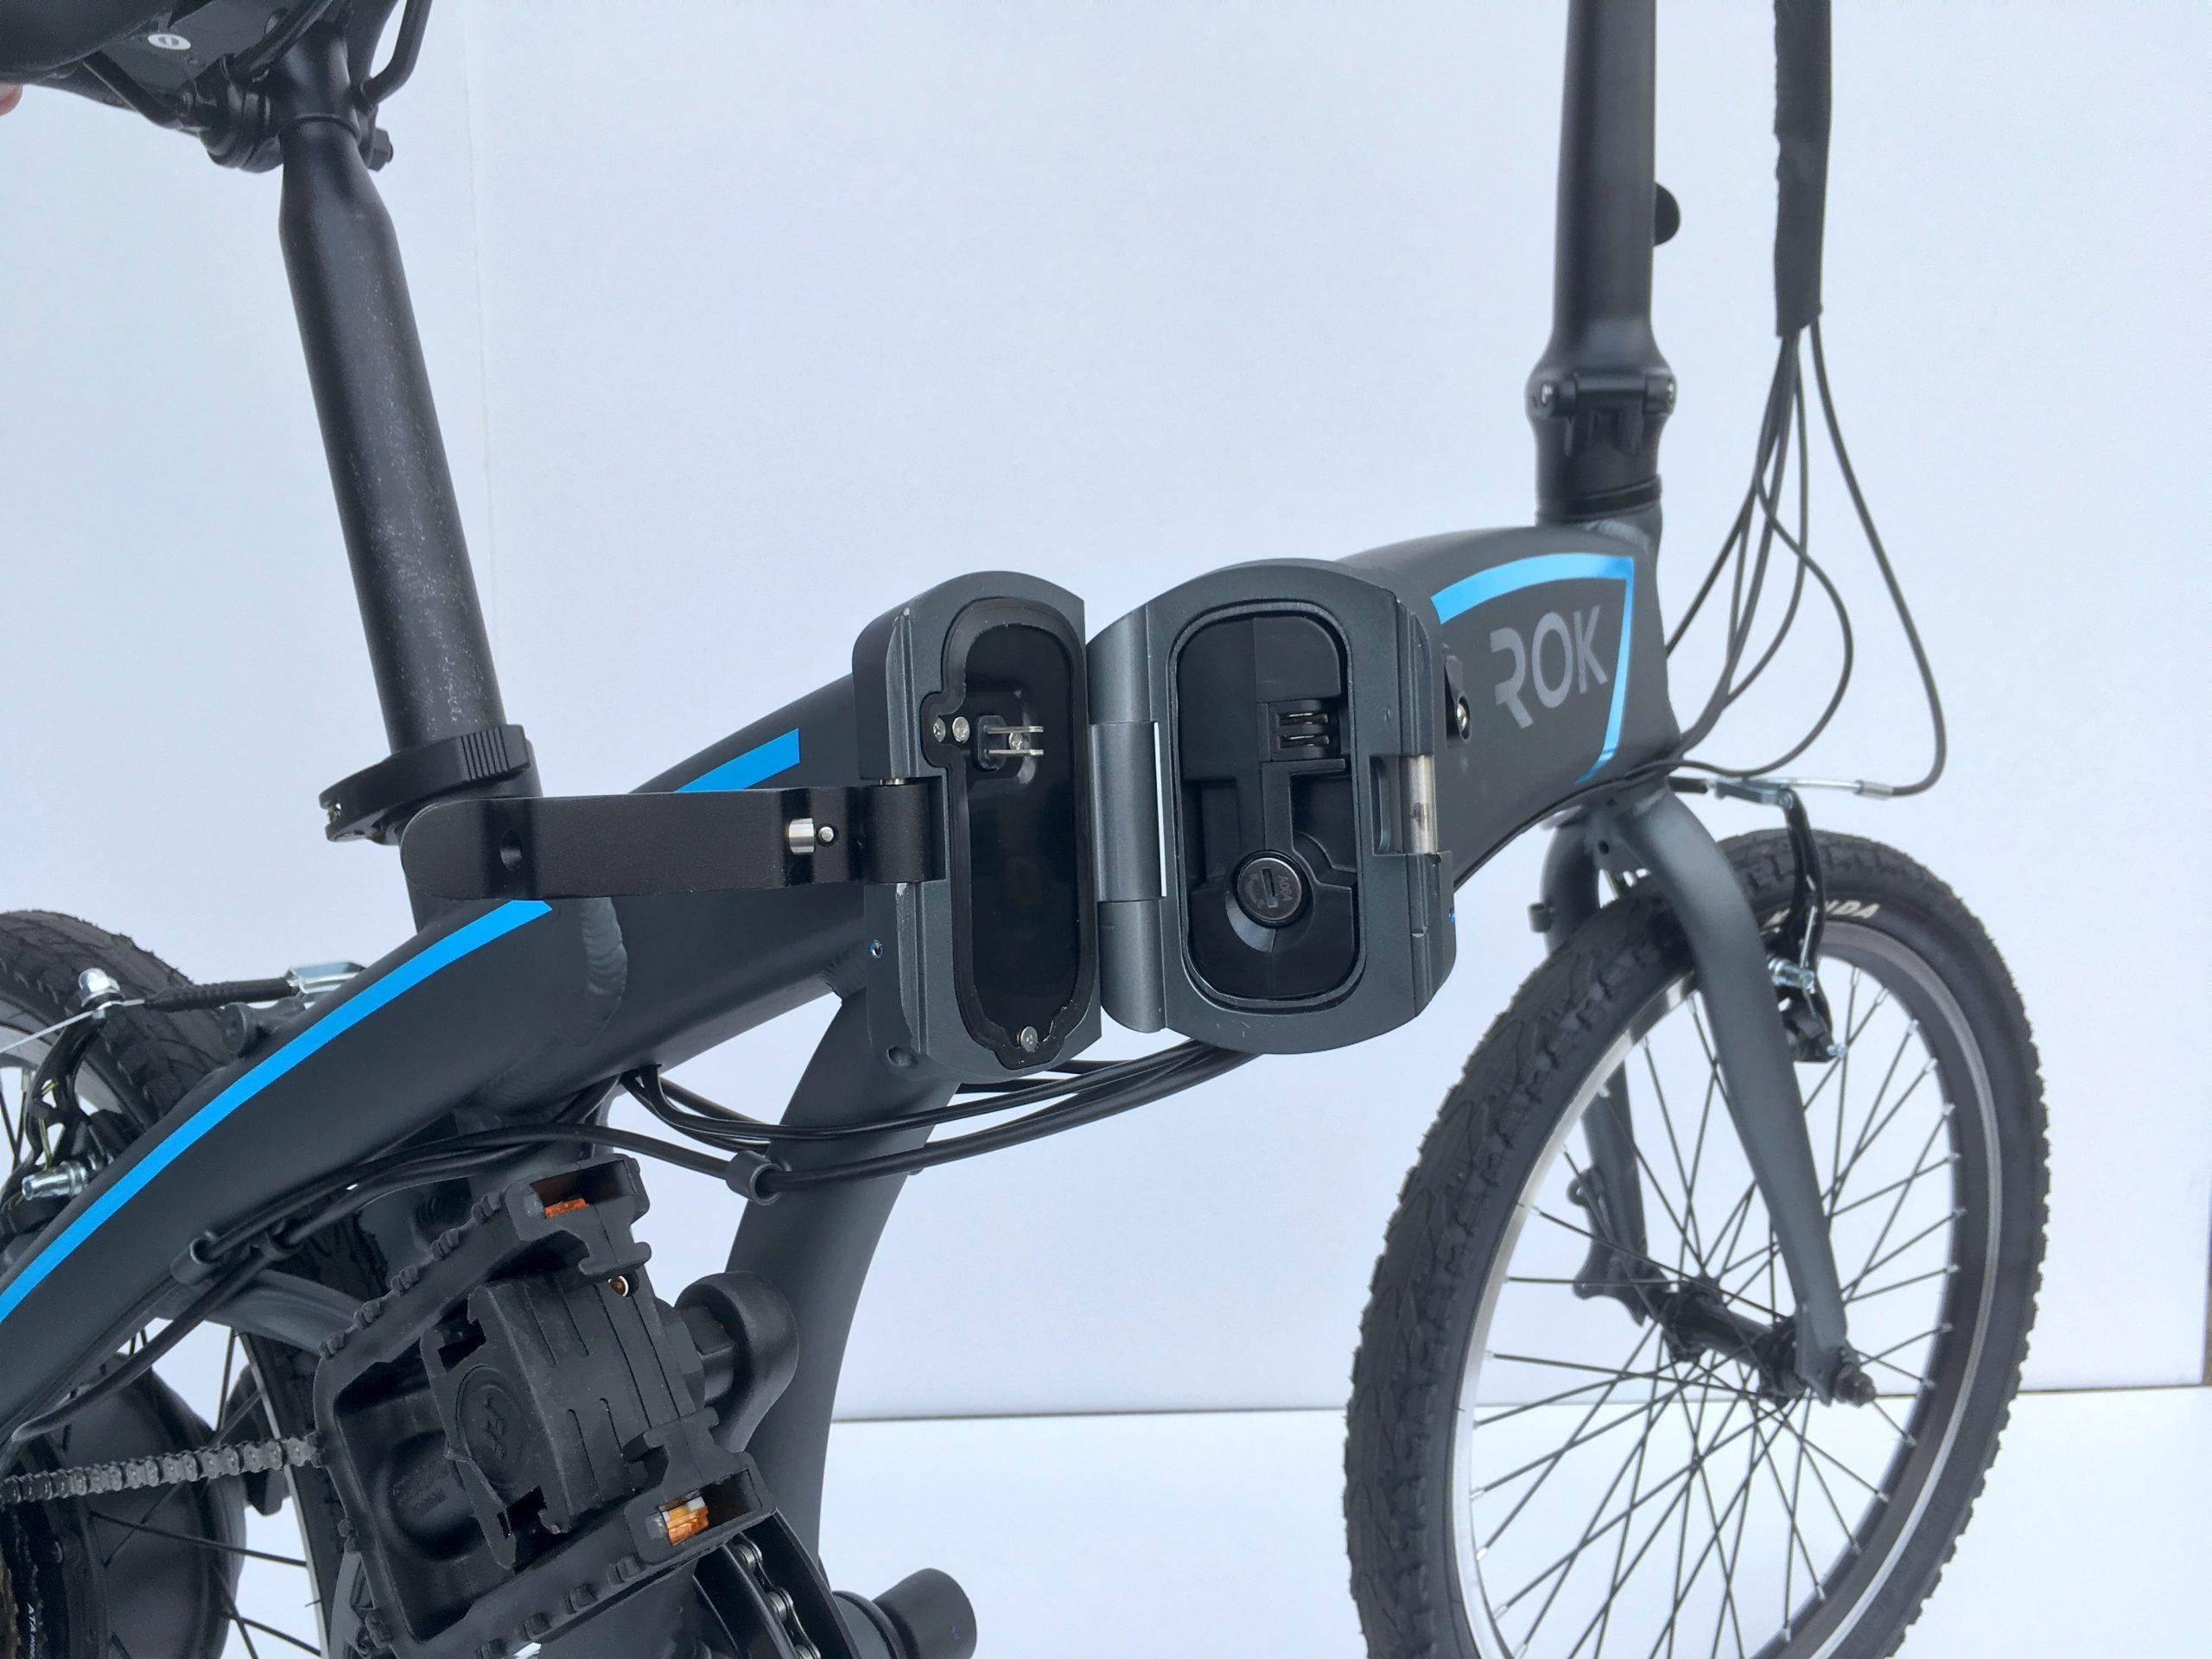 ROK Electric Folding Bike